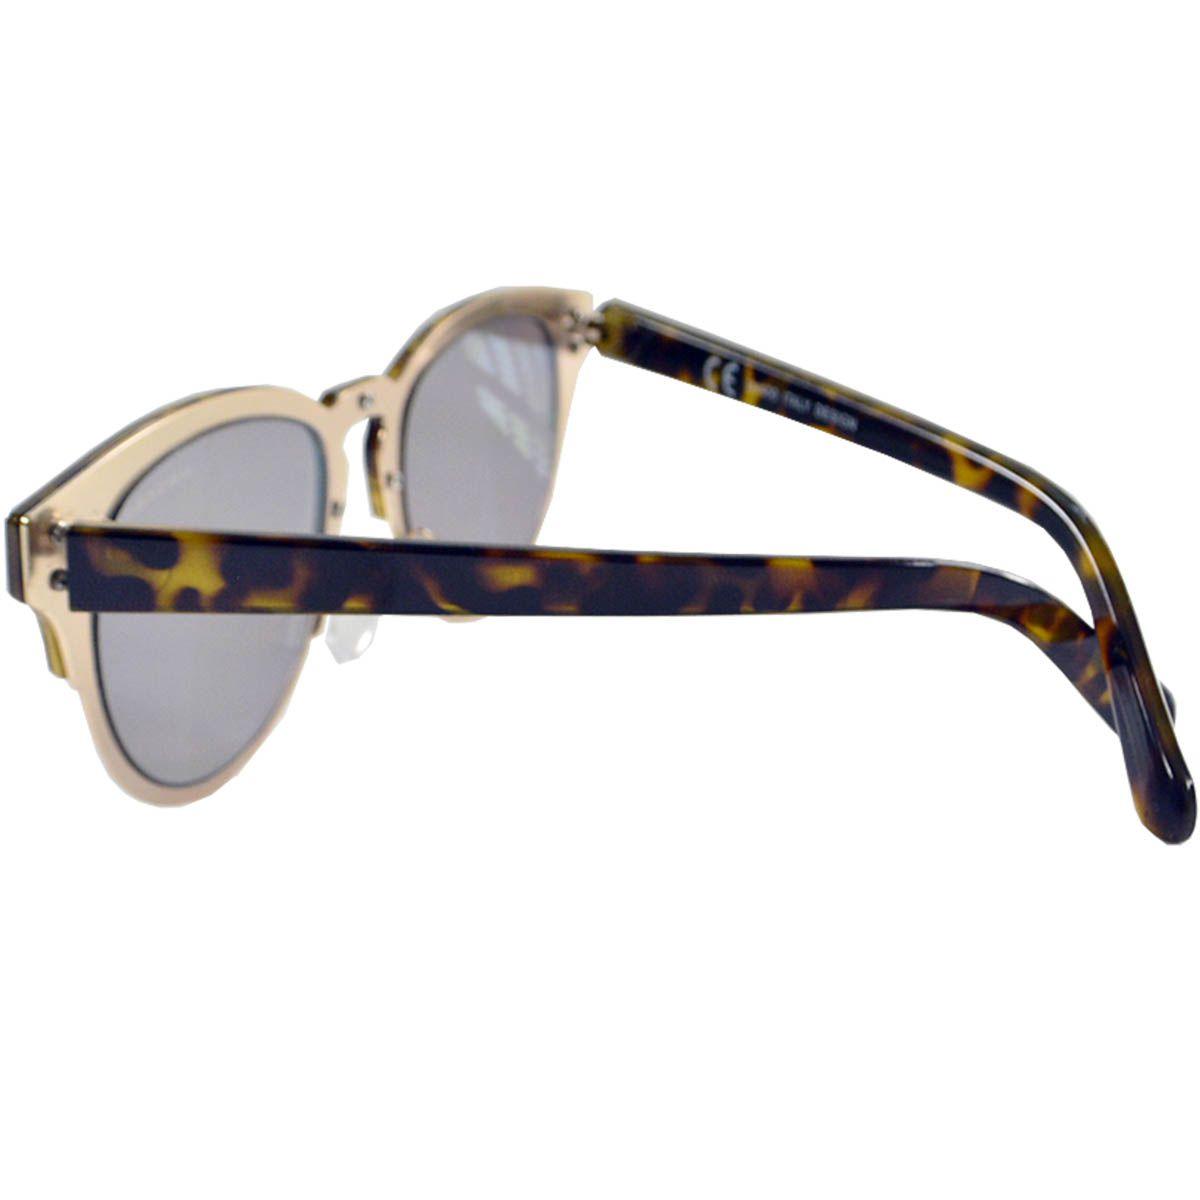 Óculos de Sol Feminino Mackage AMK18219606C47 - Tarta/Dourado